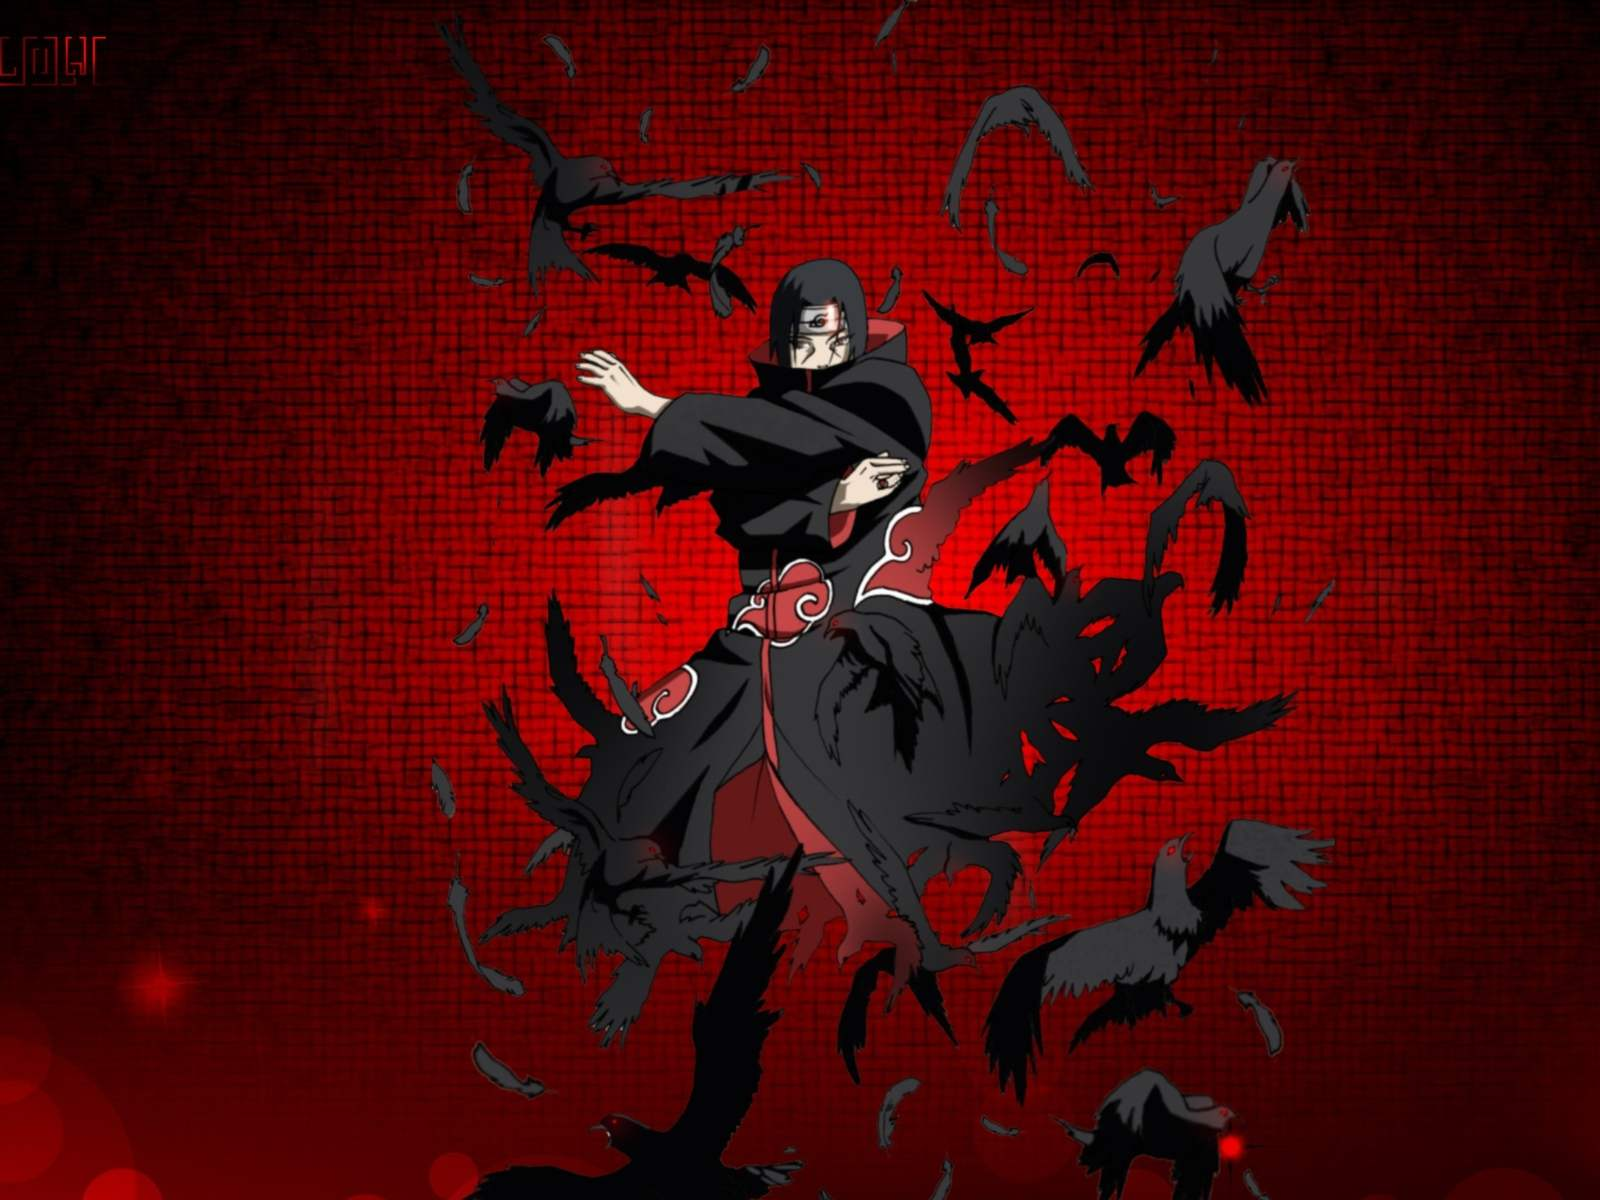 Download the Naruto anime wallpaper titled Itachi Wallpaper 2 1600x1200